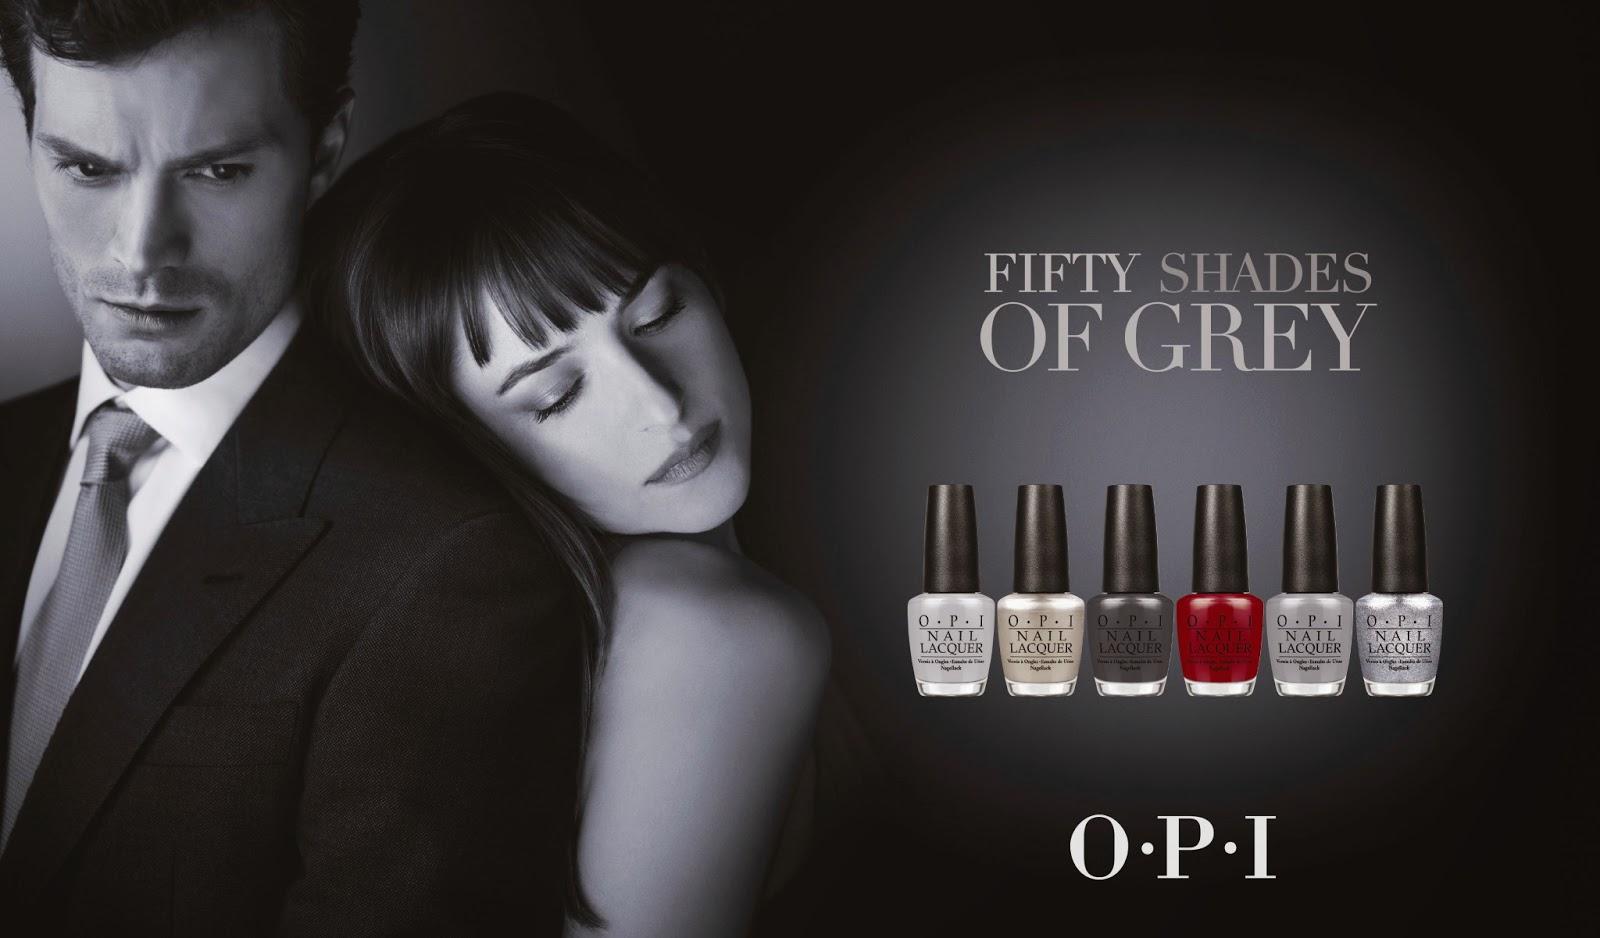 PHOTOS Fifty Shades Of Grey OPI Nail Polish Make Up For Ever Ads